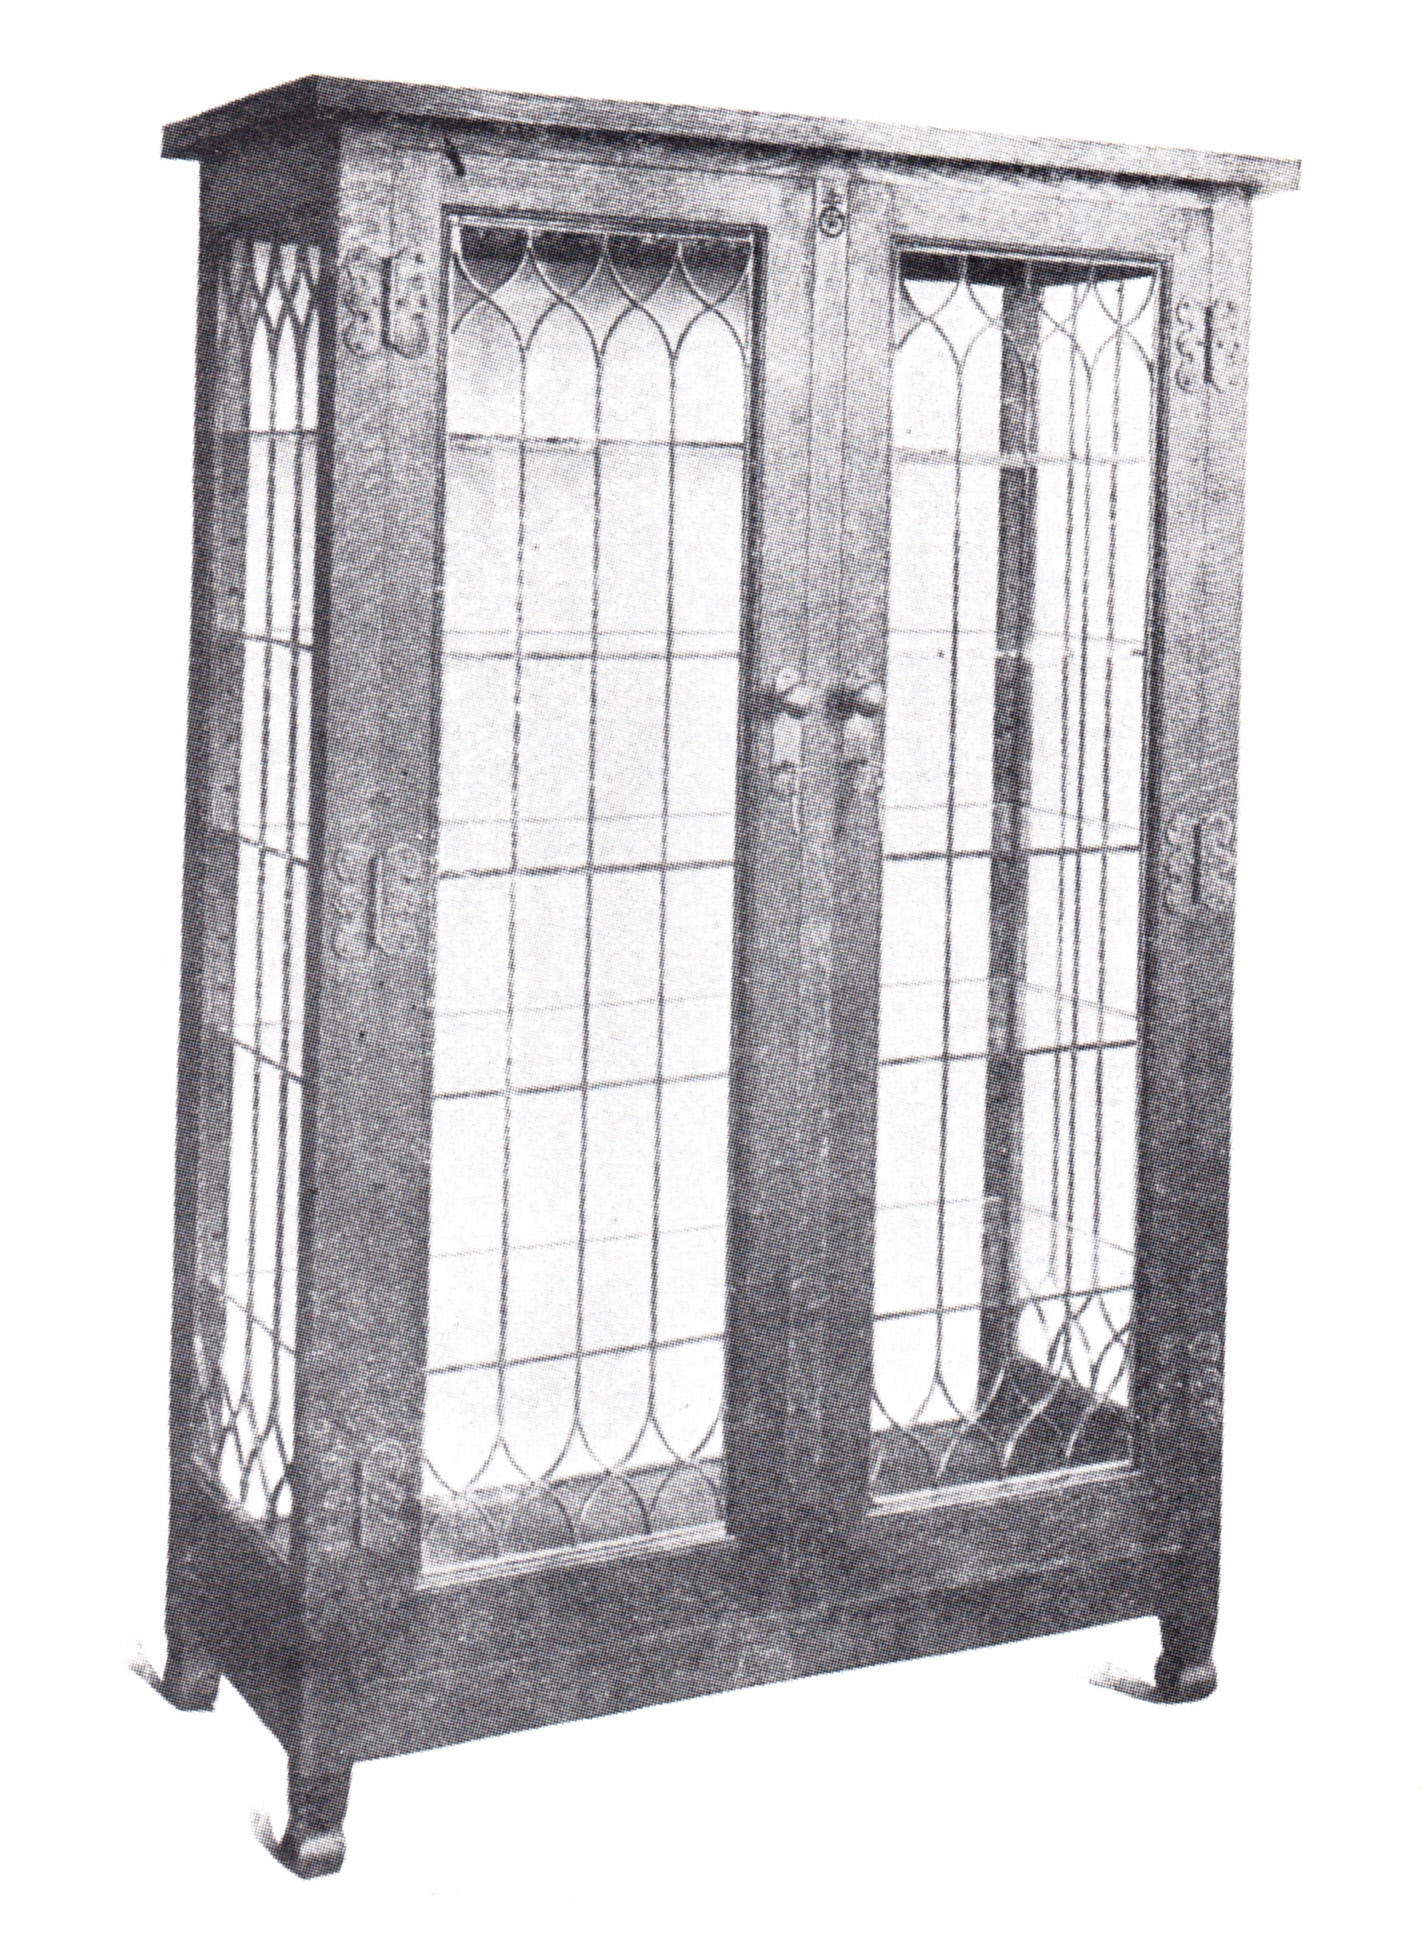 Furniture - Roycroft - 07 1/2-O - China Cabinet